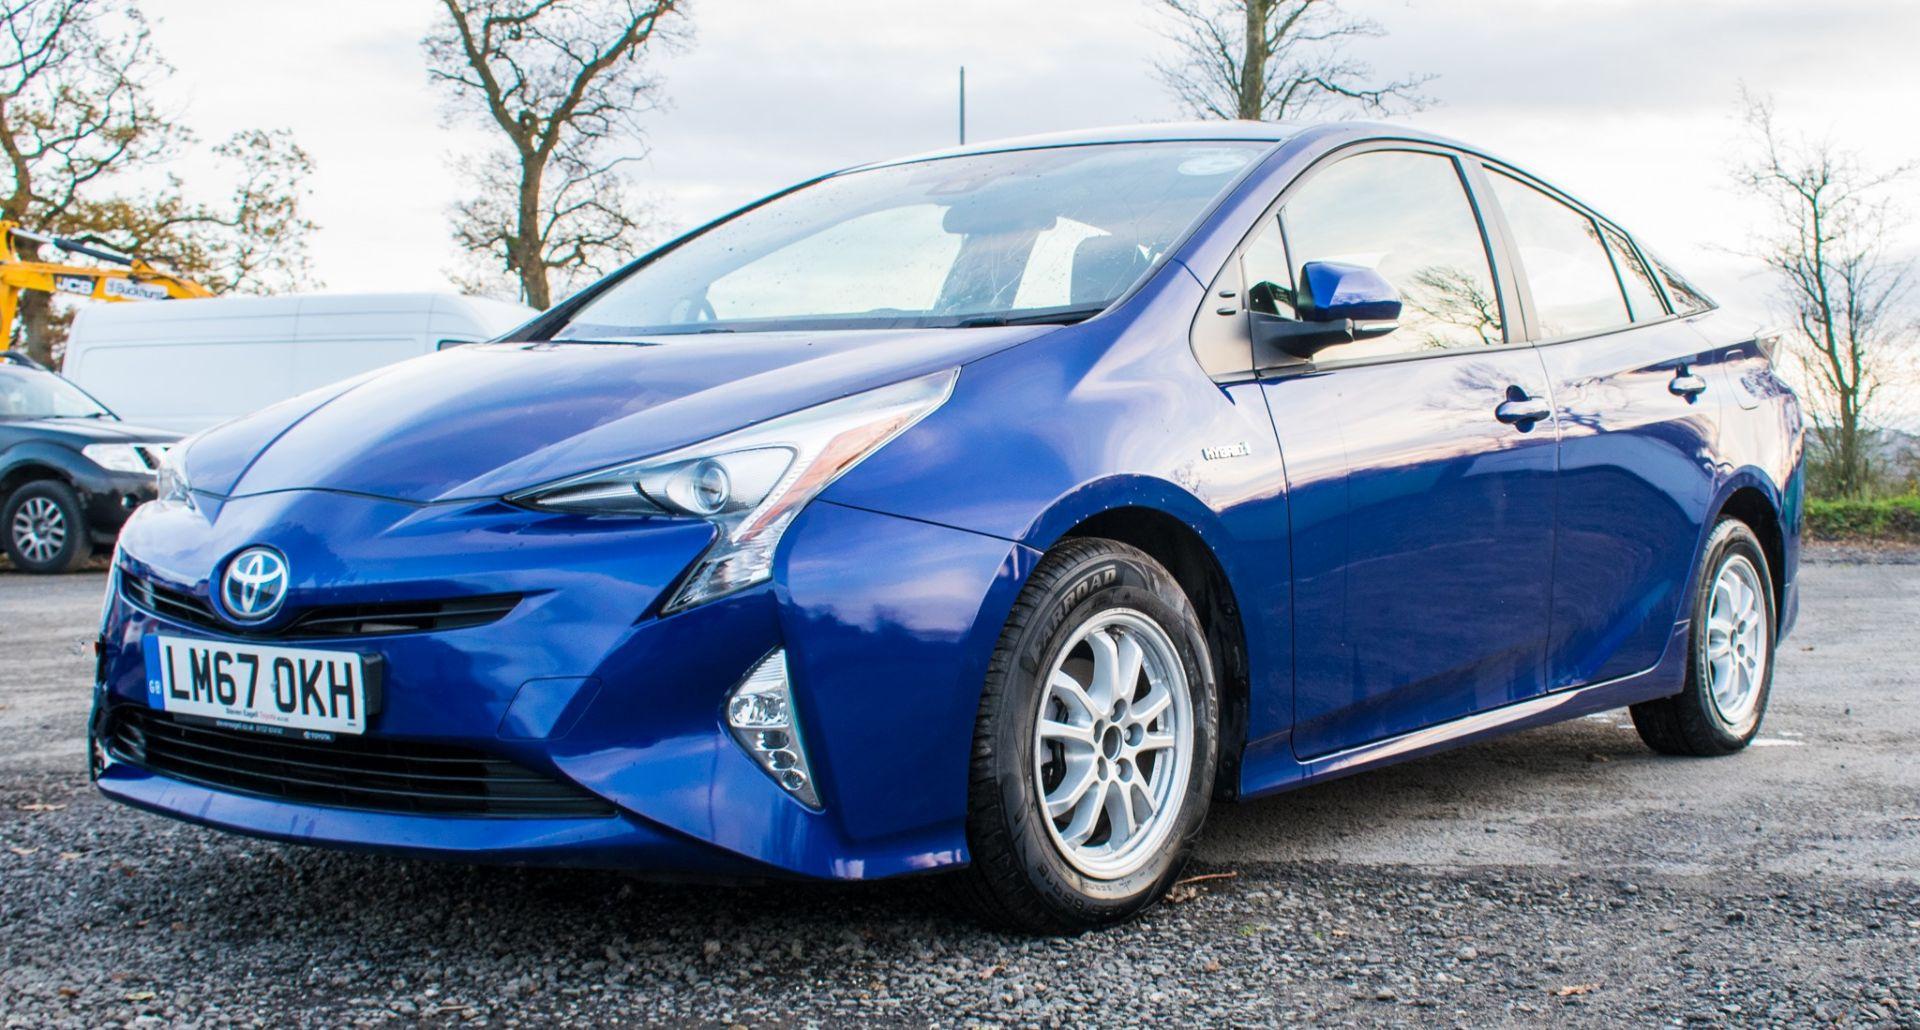 ToyotaPrius ActiveHybrid Electric 5 doorHatchback  Registration Number: LM67 OKH Date of First